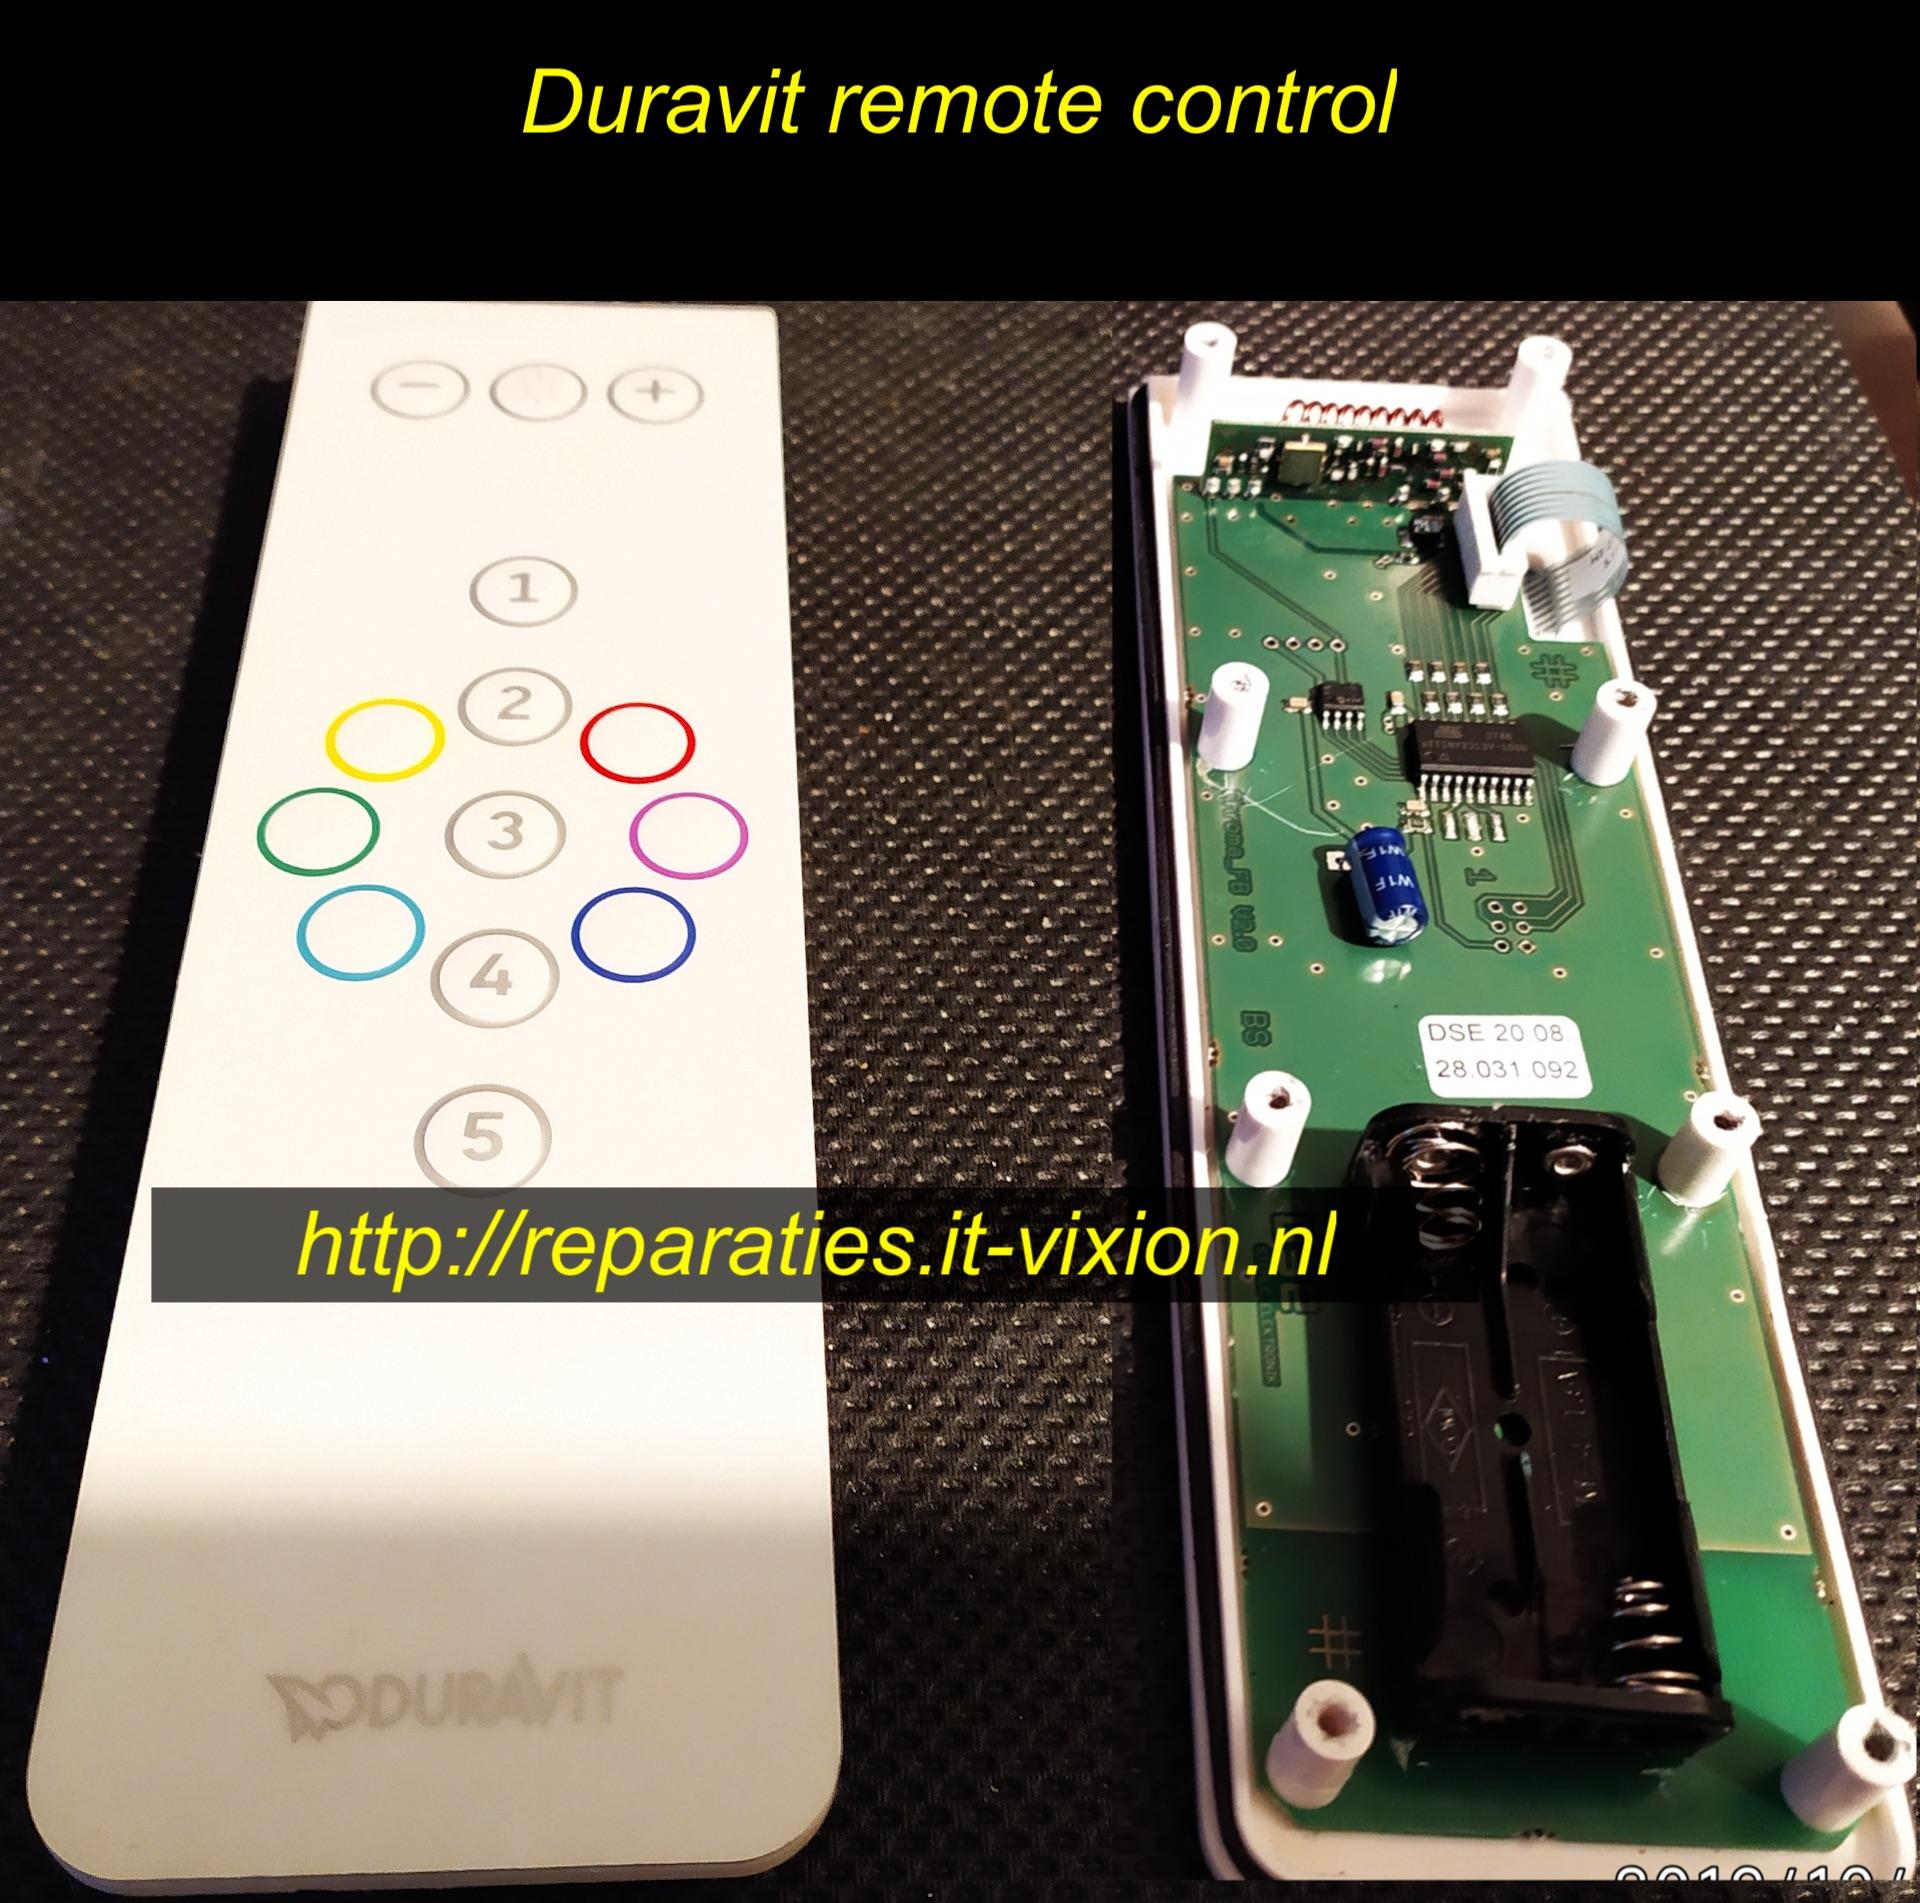 Duravit remote control